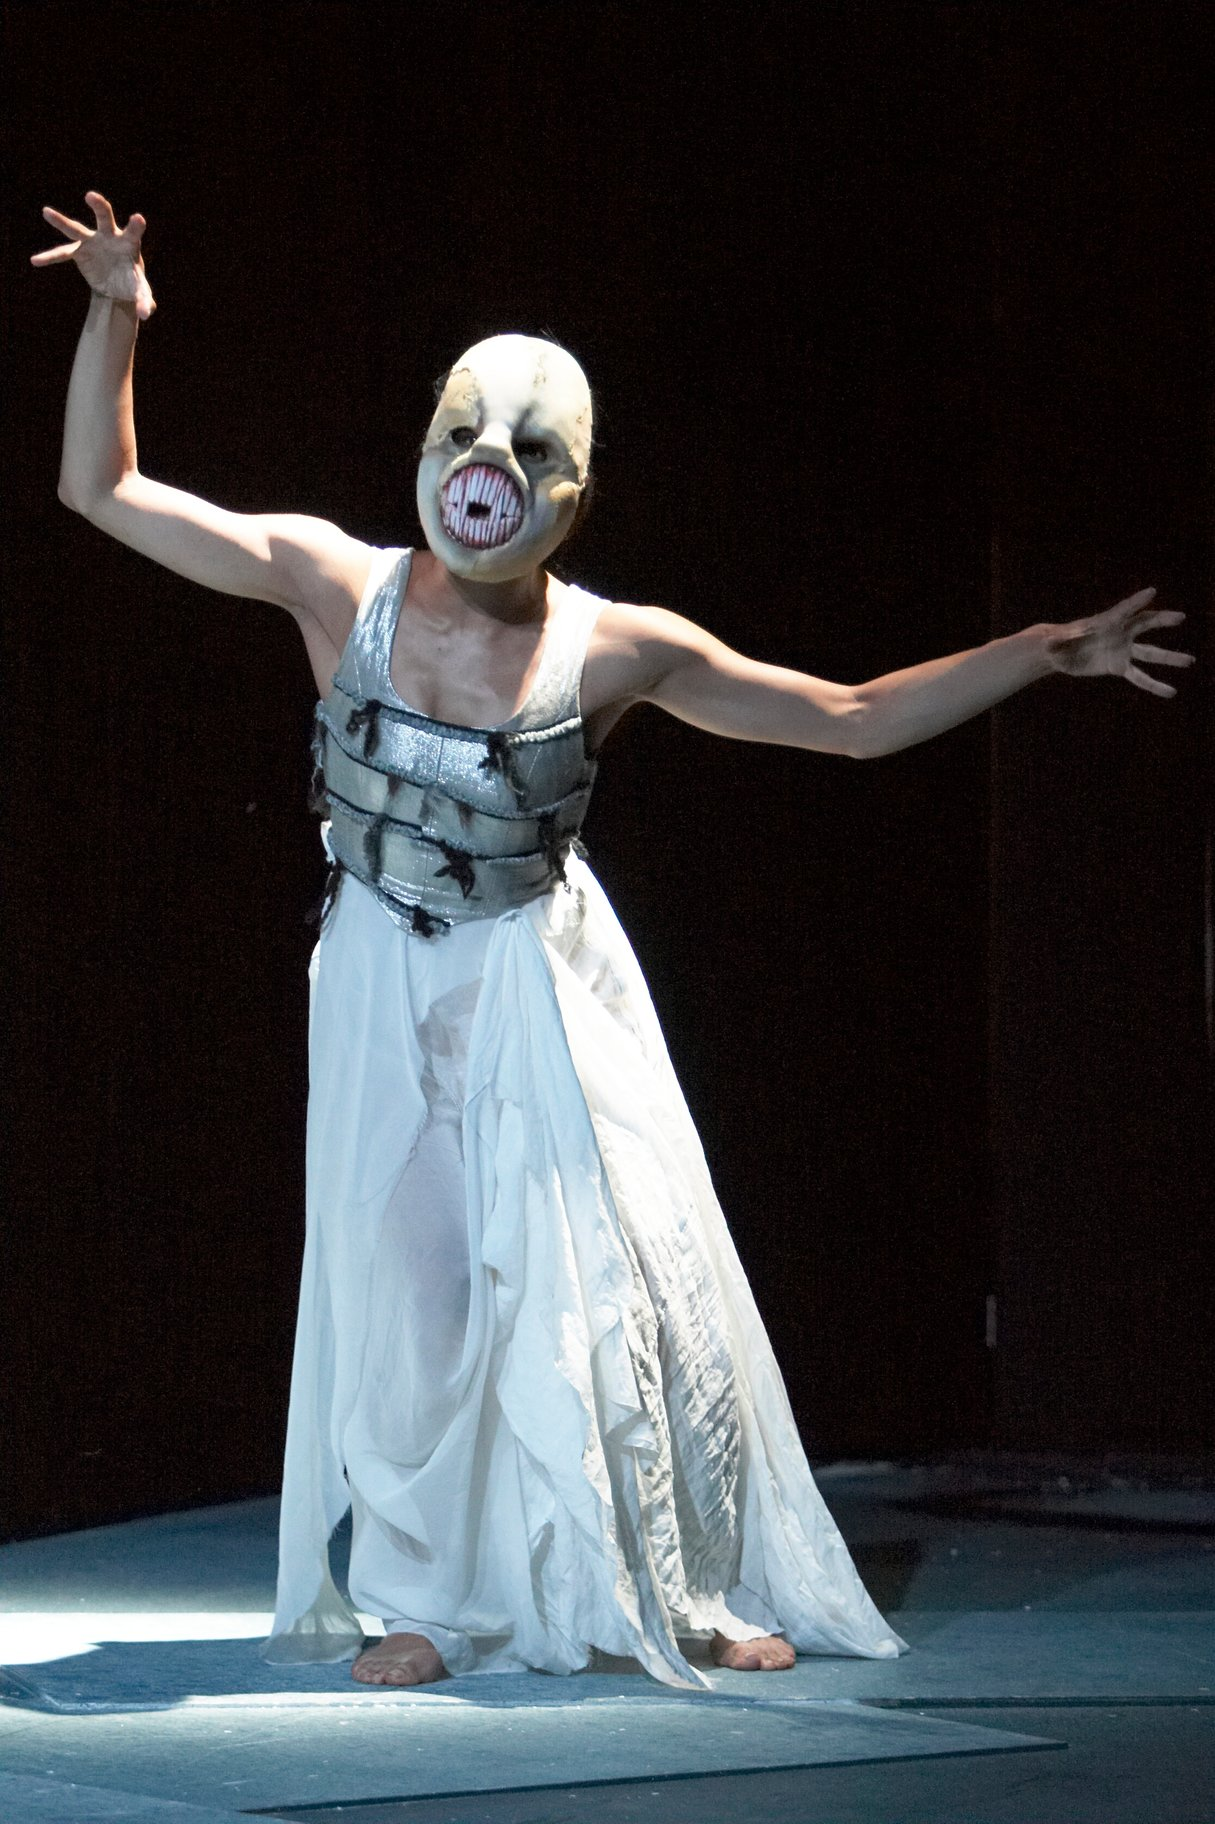 A spirit of the island, wearing a fish-like mask.